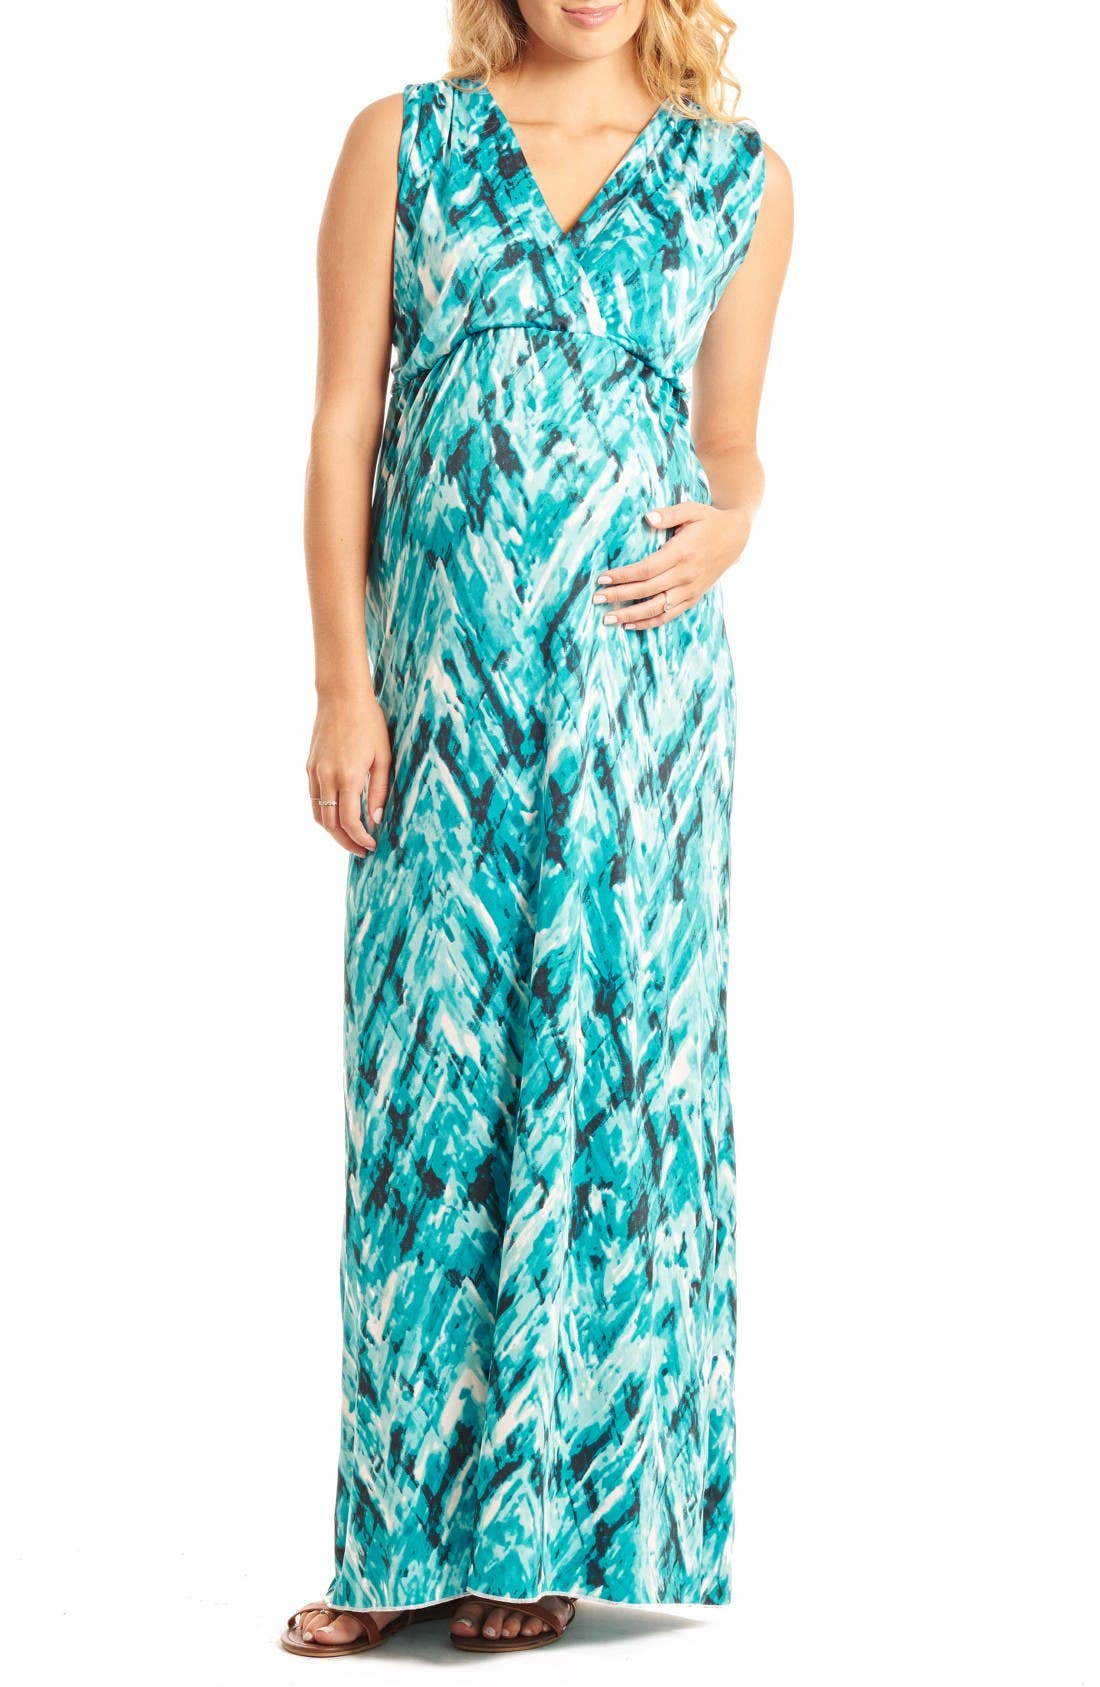 Everly Grey 'Jill' Maternity Maxi Dress